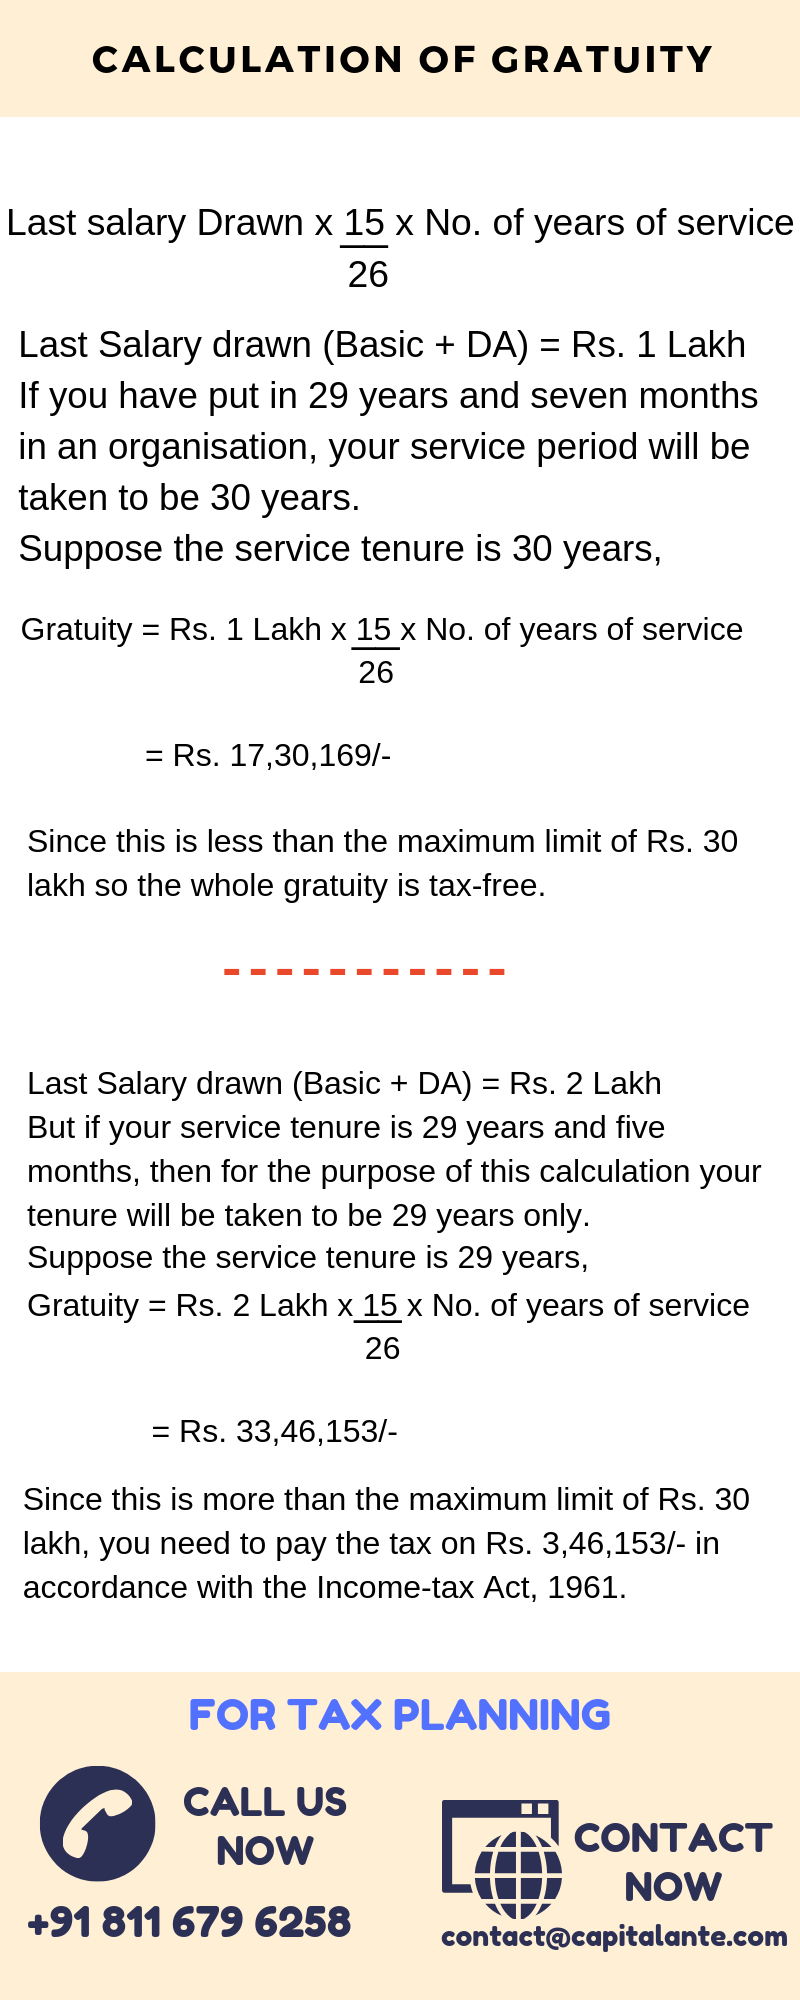 Tax implications on Gratuity